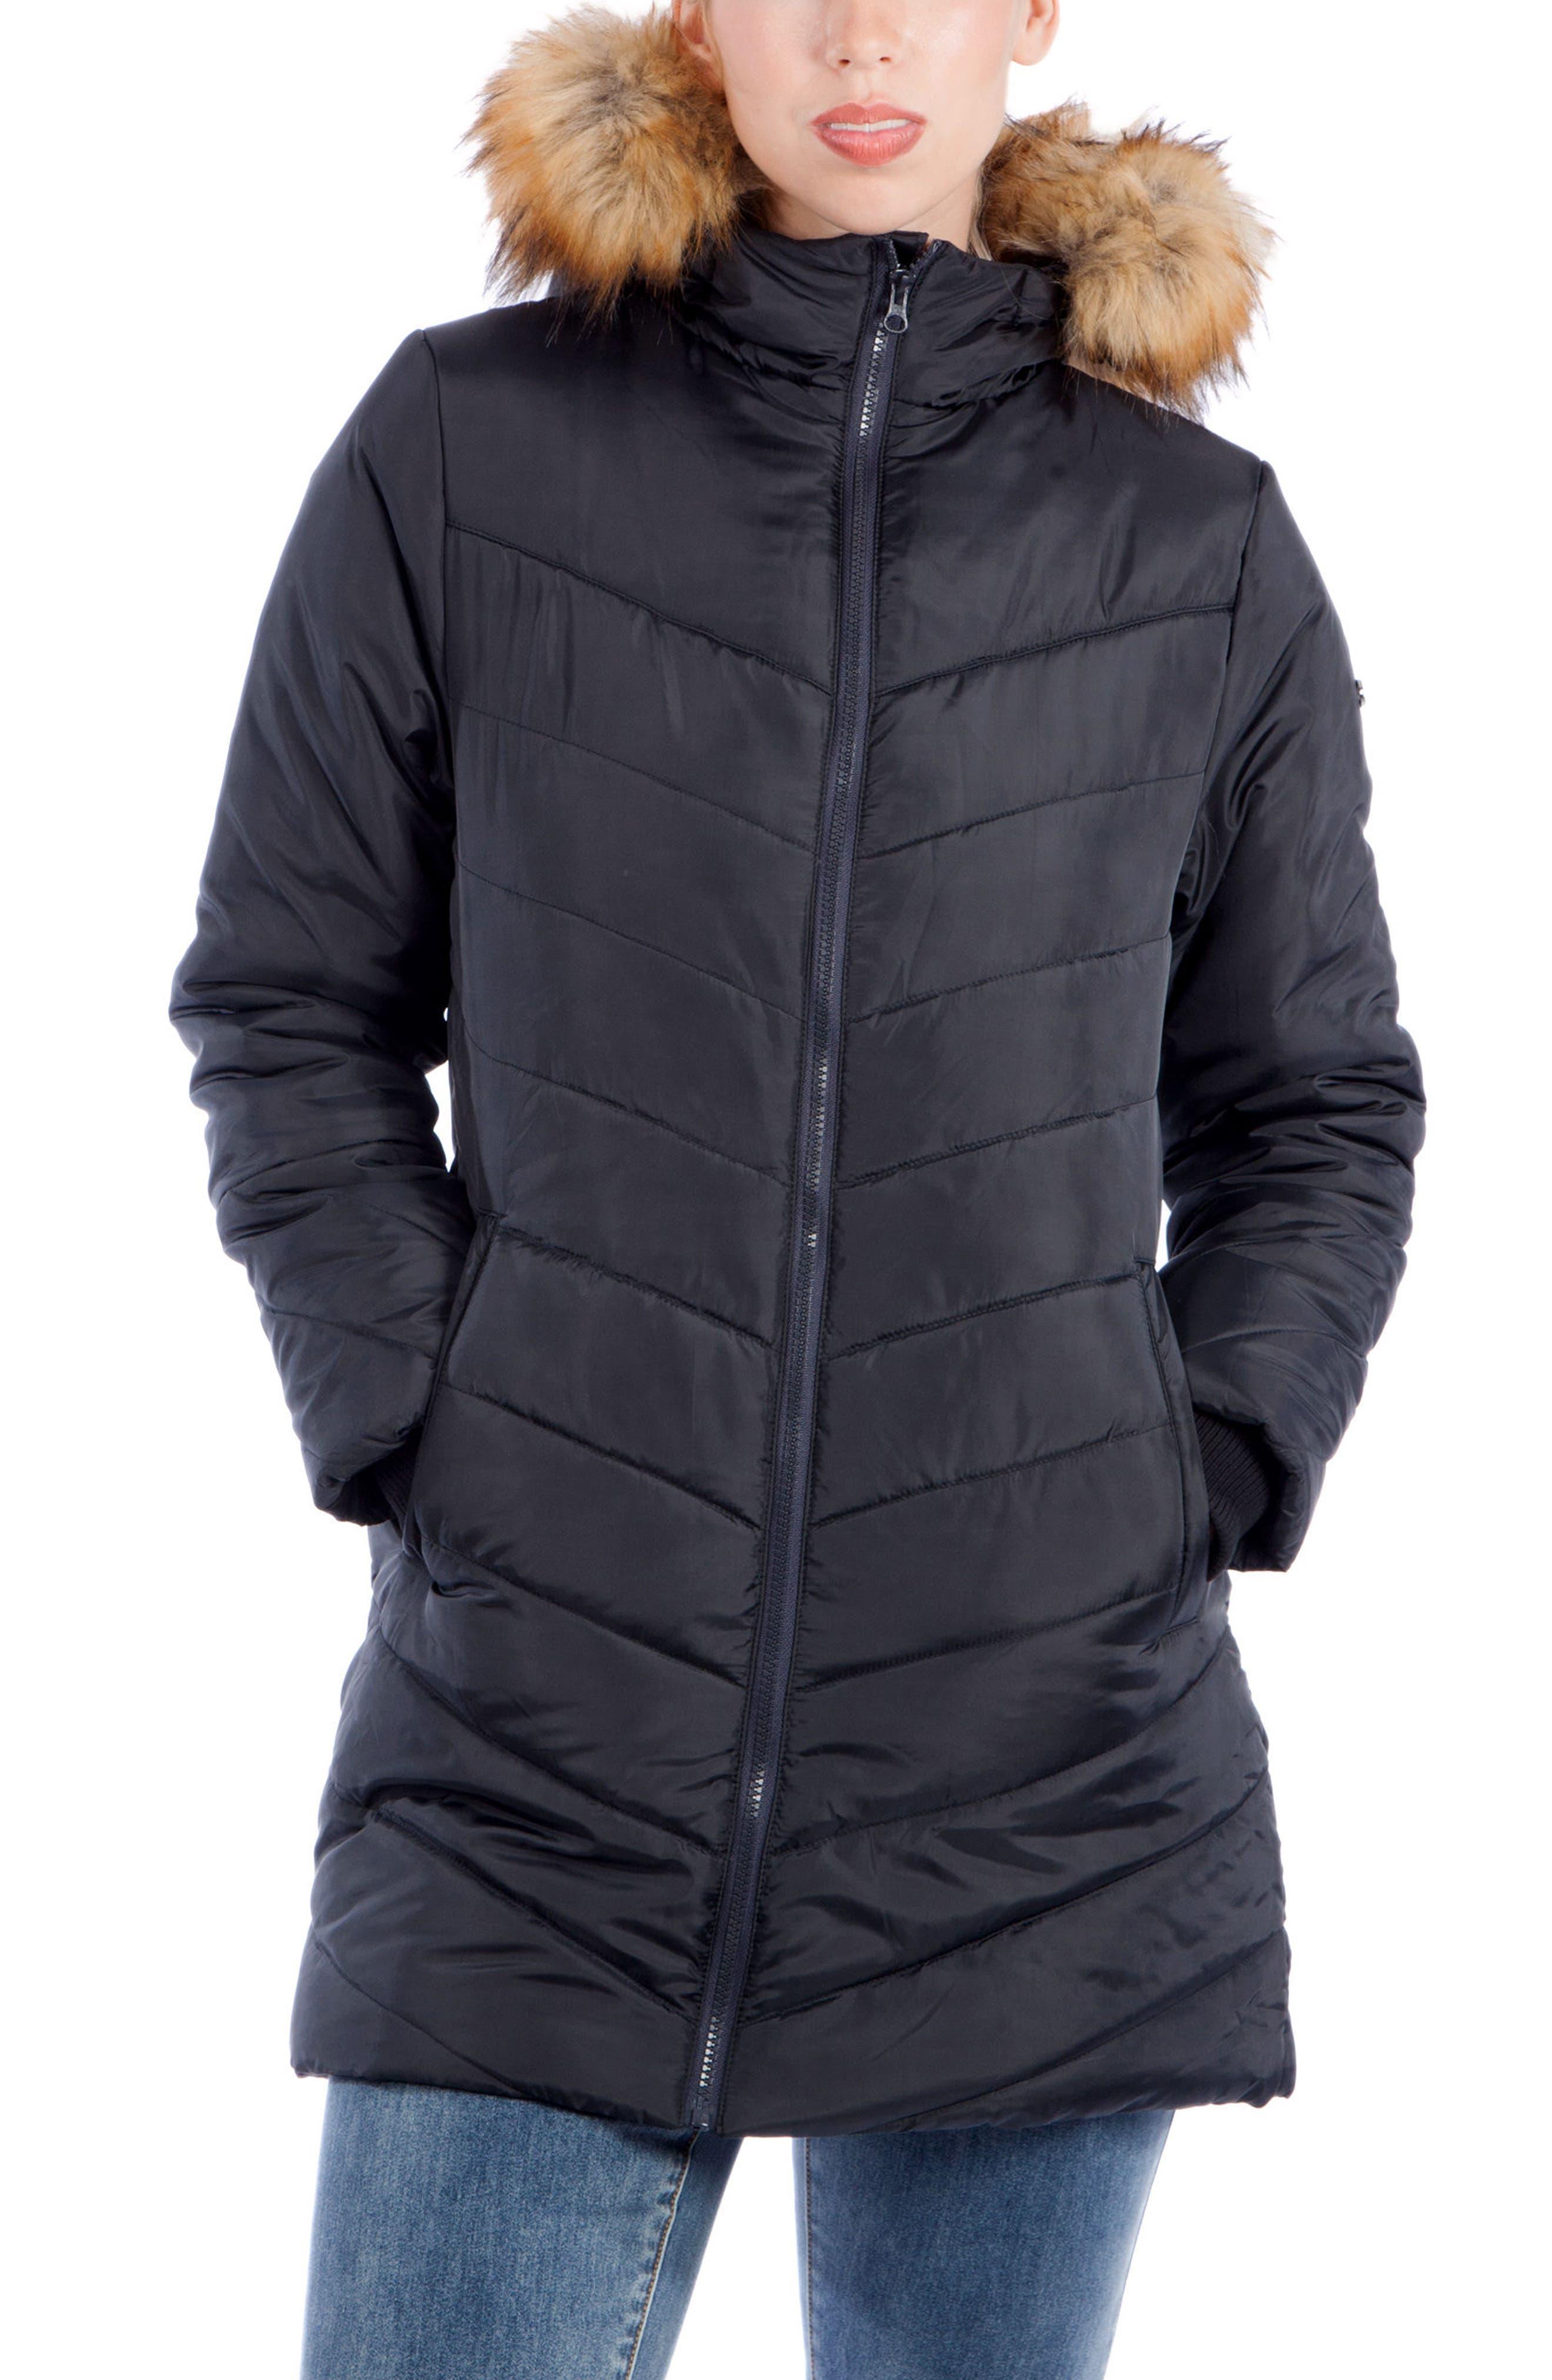 MODERN ETERNITY, Faux Fur Trim Convertible Puffer 3-in-1 Maternity Jacket, Main thumbnail 1, color, BLACK